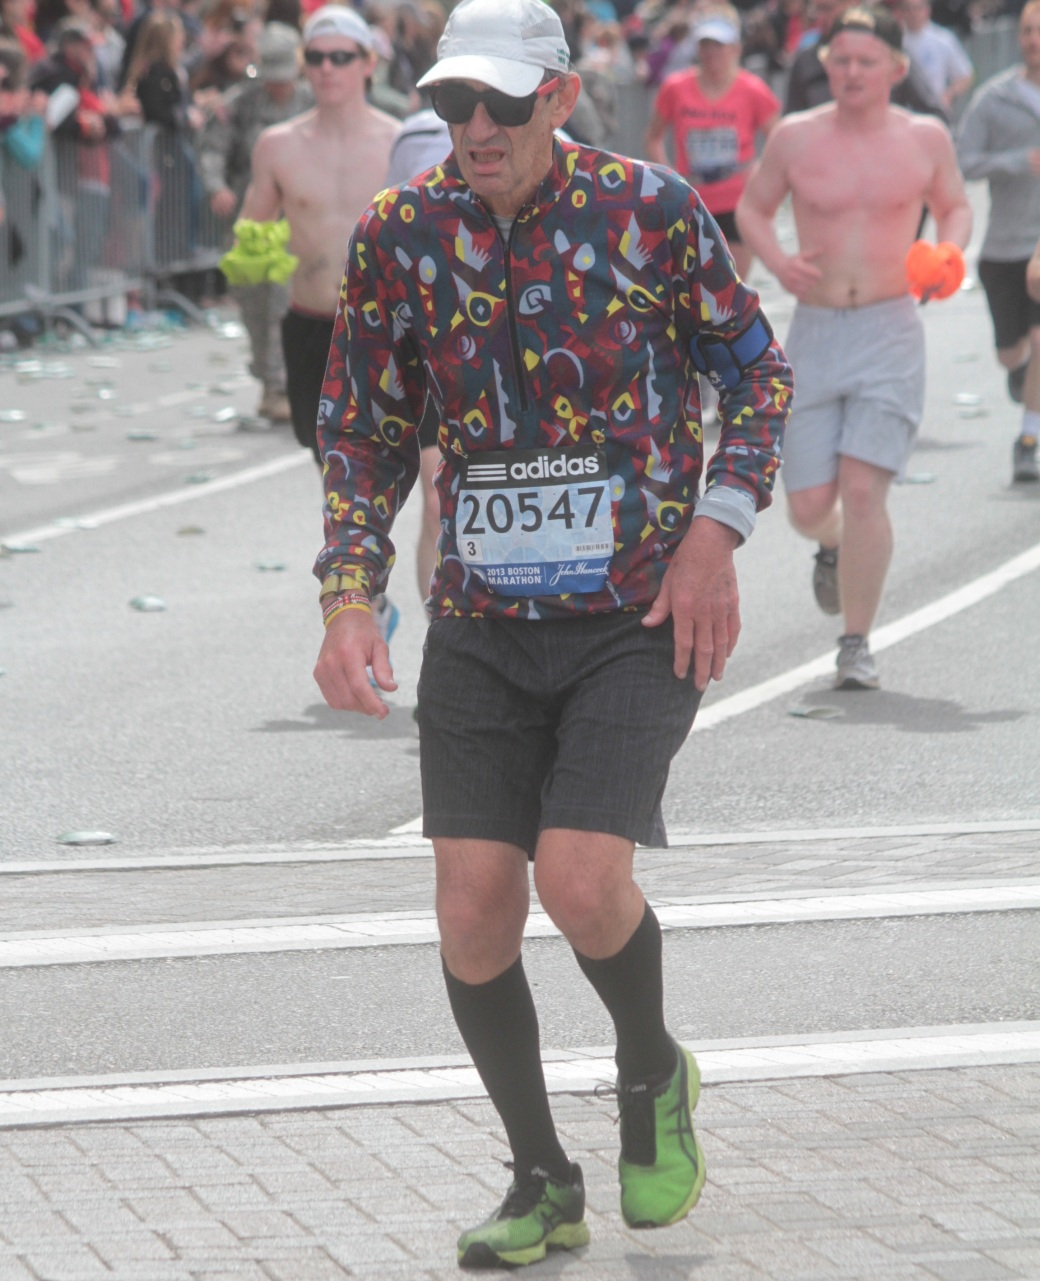 boston marathon 2013 number 20547